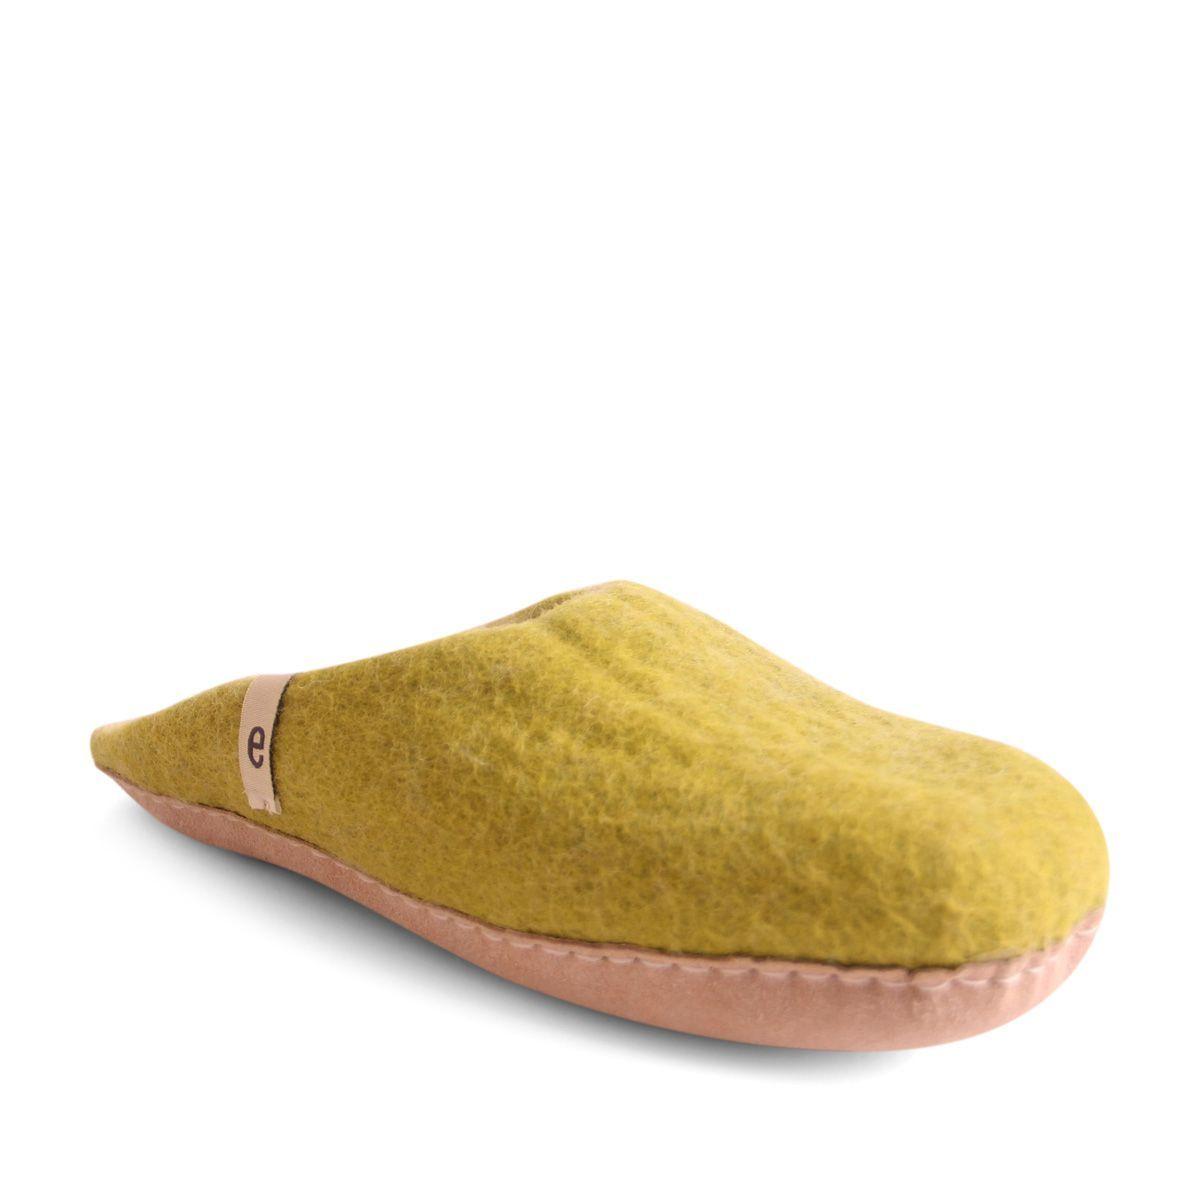 Egos Slip-on Indoor Shoe Simple in Lime Green